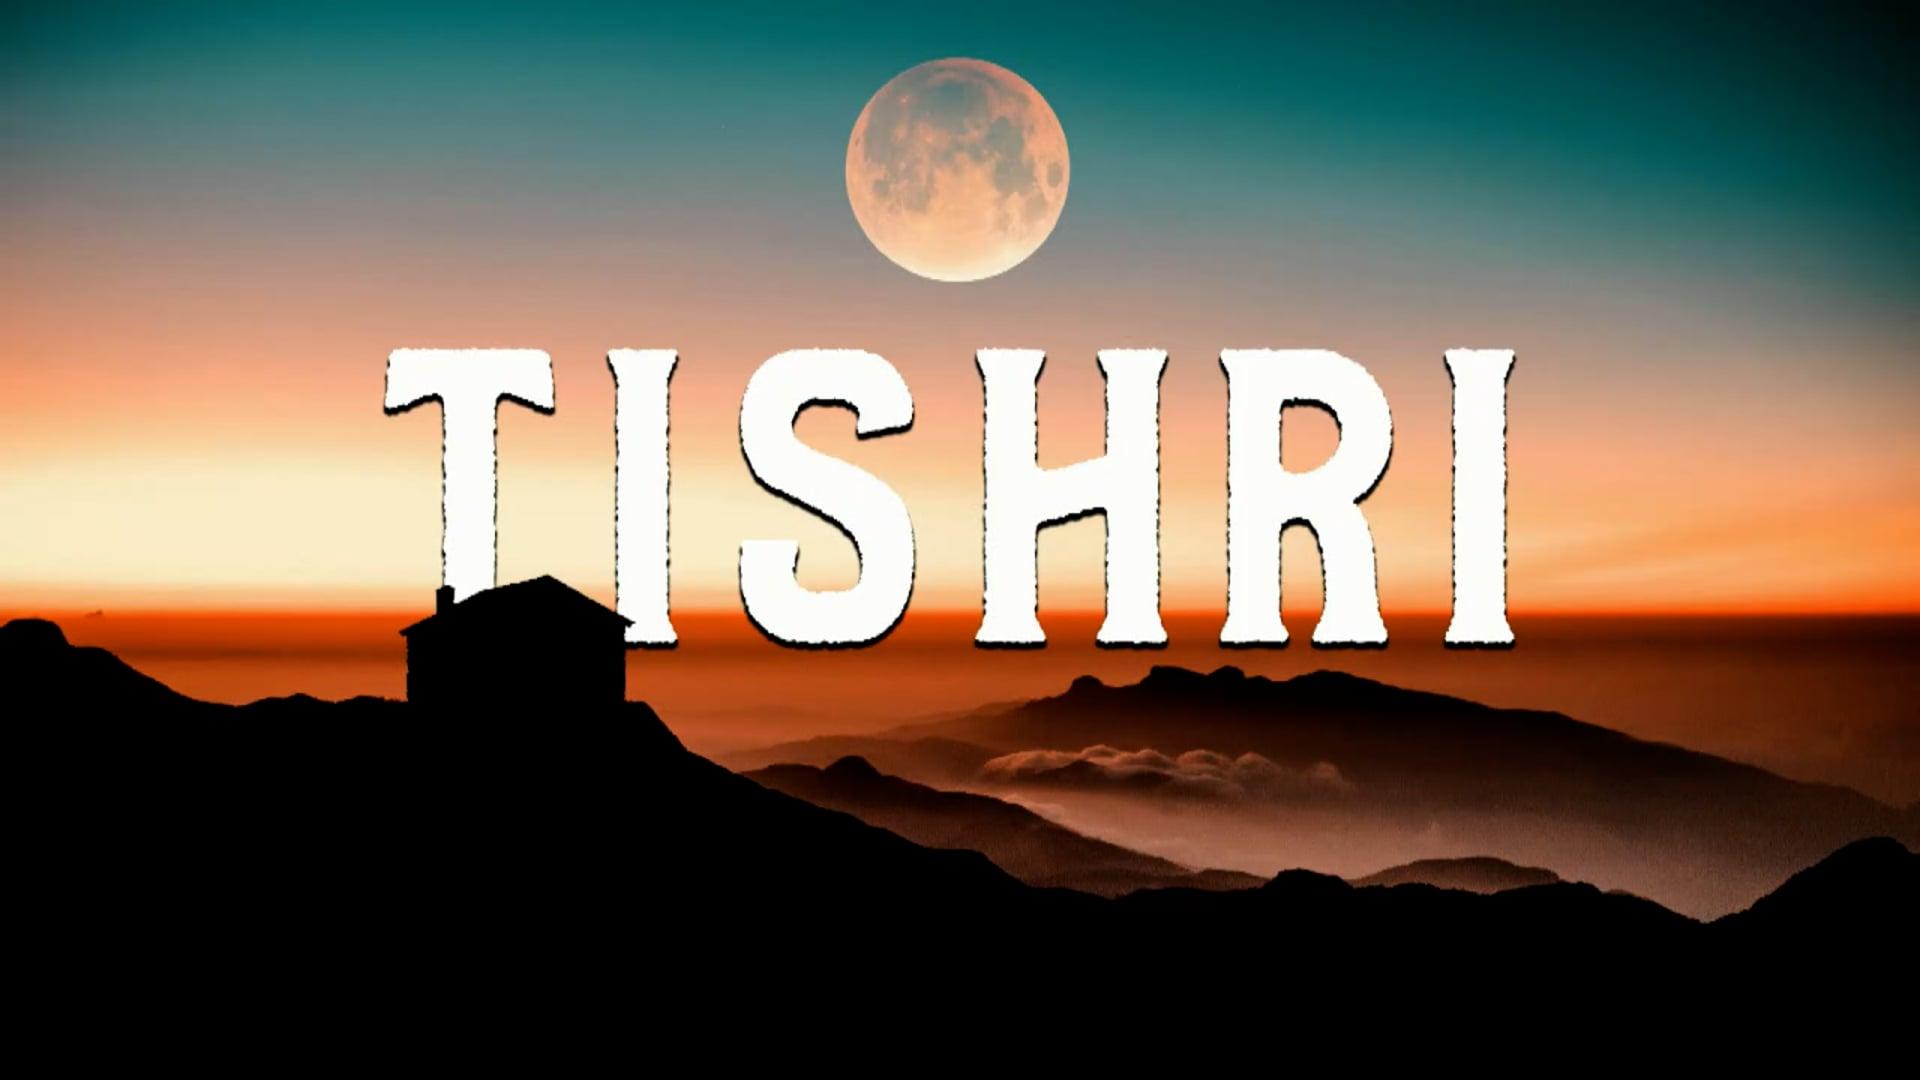 [Español] Firstfruits - Tishri 5782 - September 19th, 2021